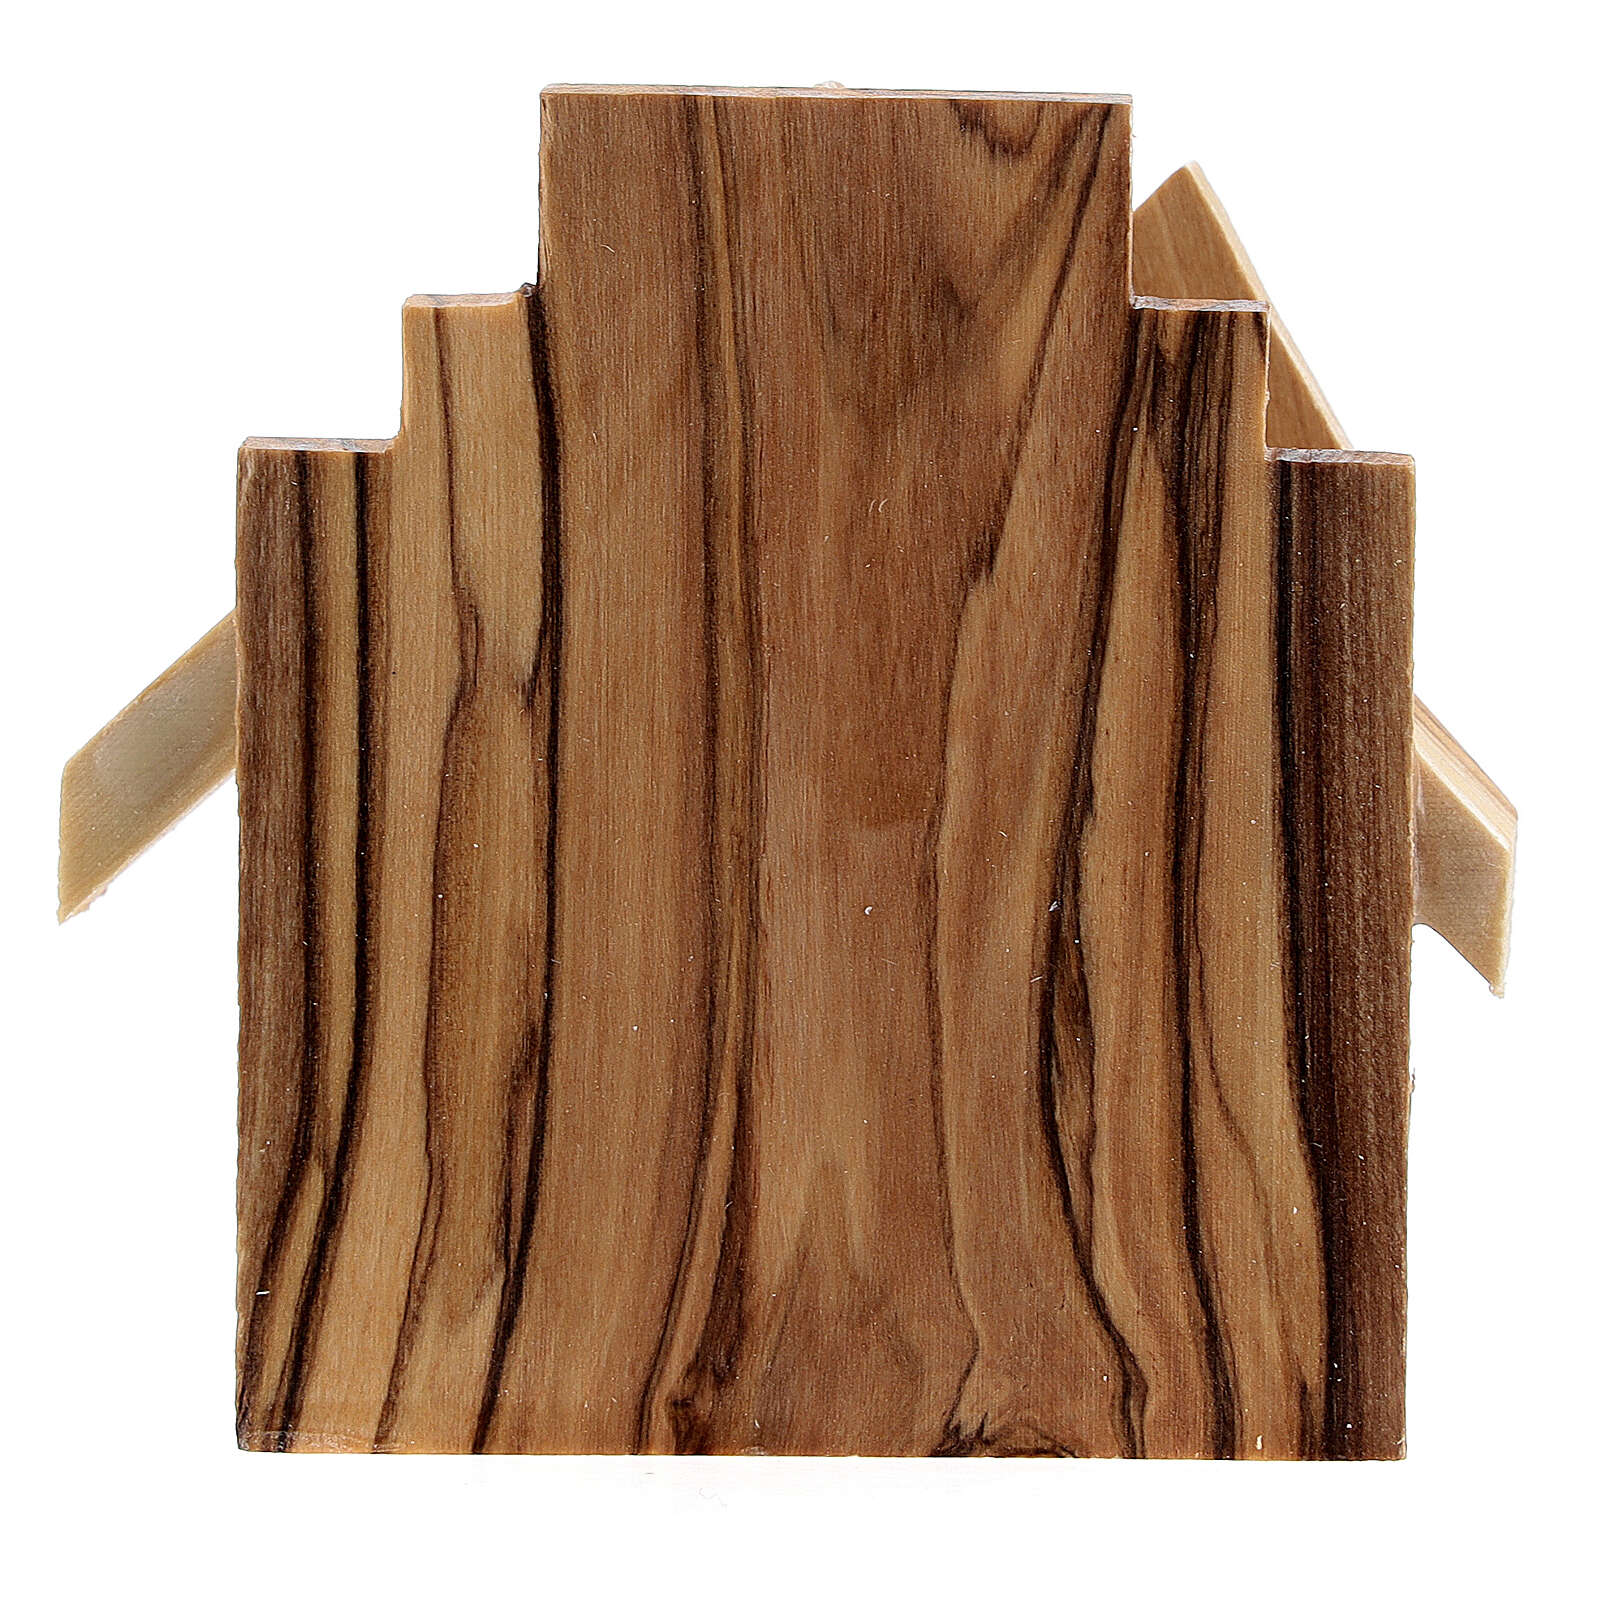 Cabana Natividade silhuetas Sagrada Família madeira de oliveira, 6,5x7x4,5 cm 4